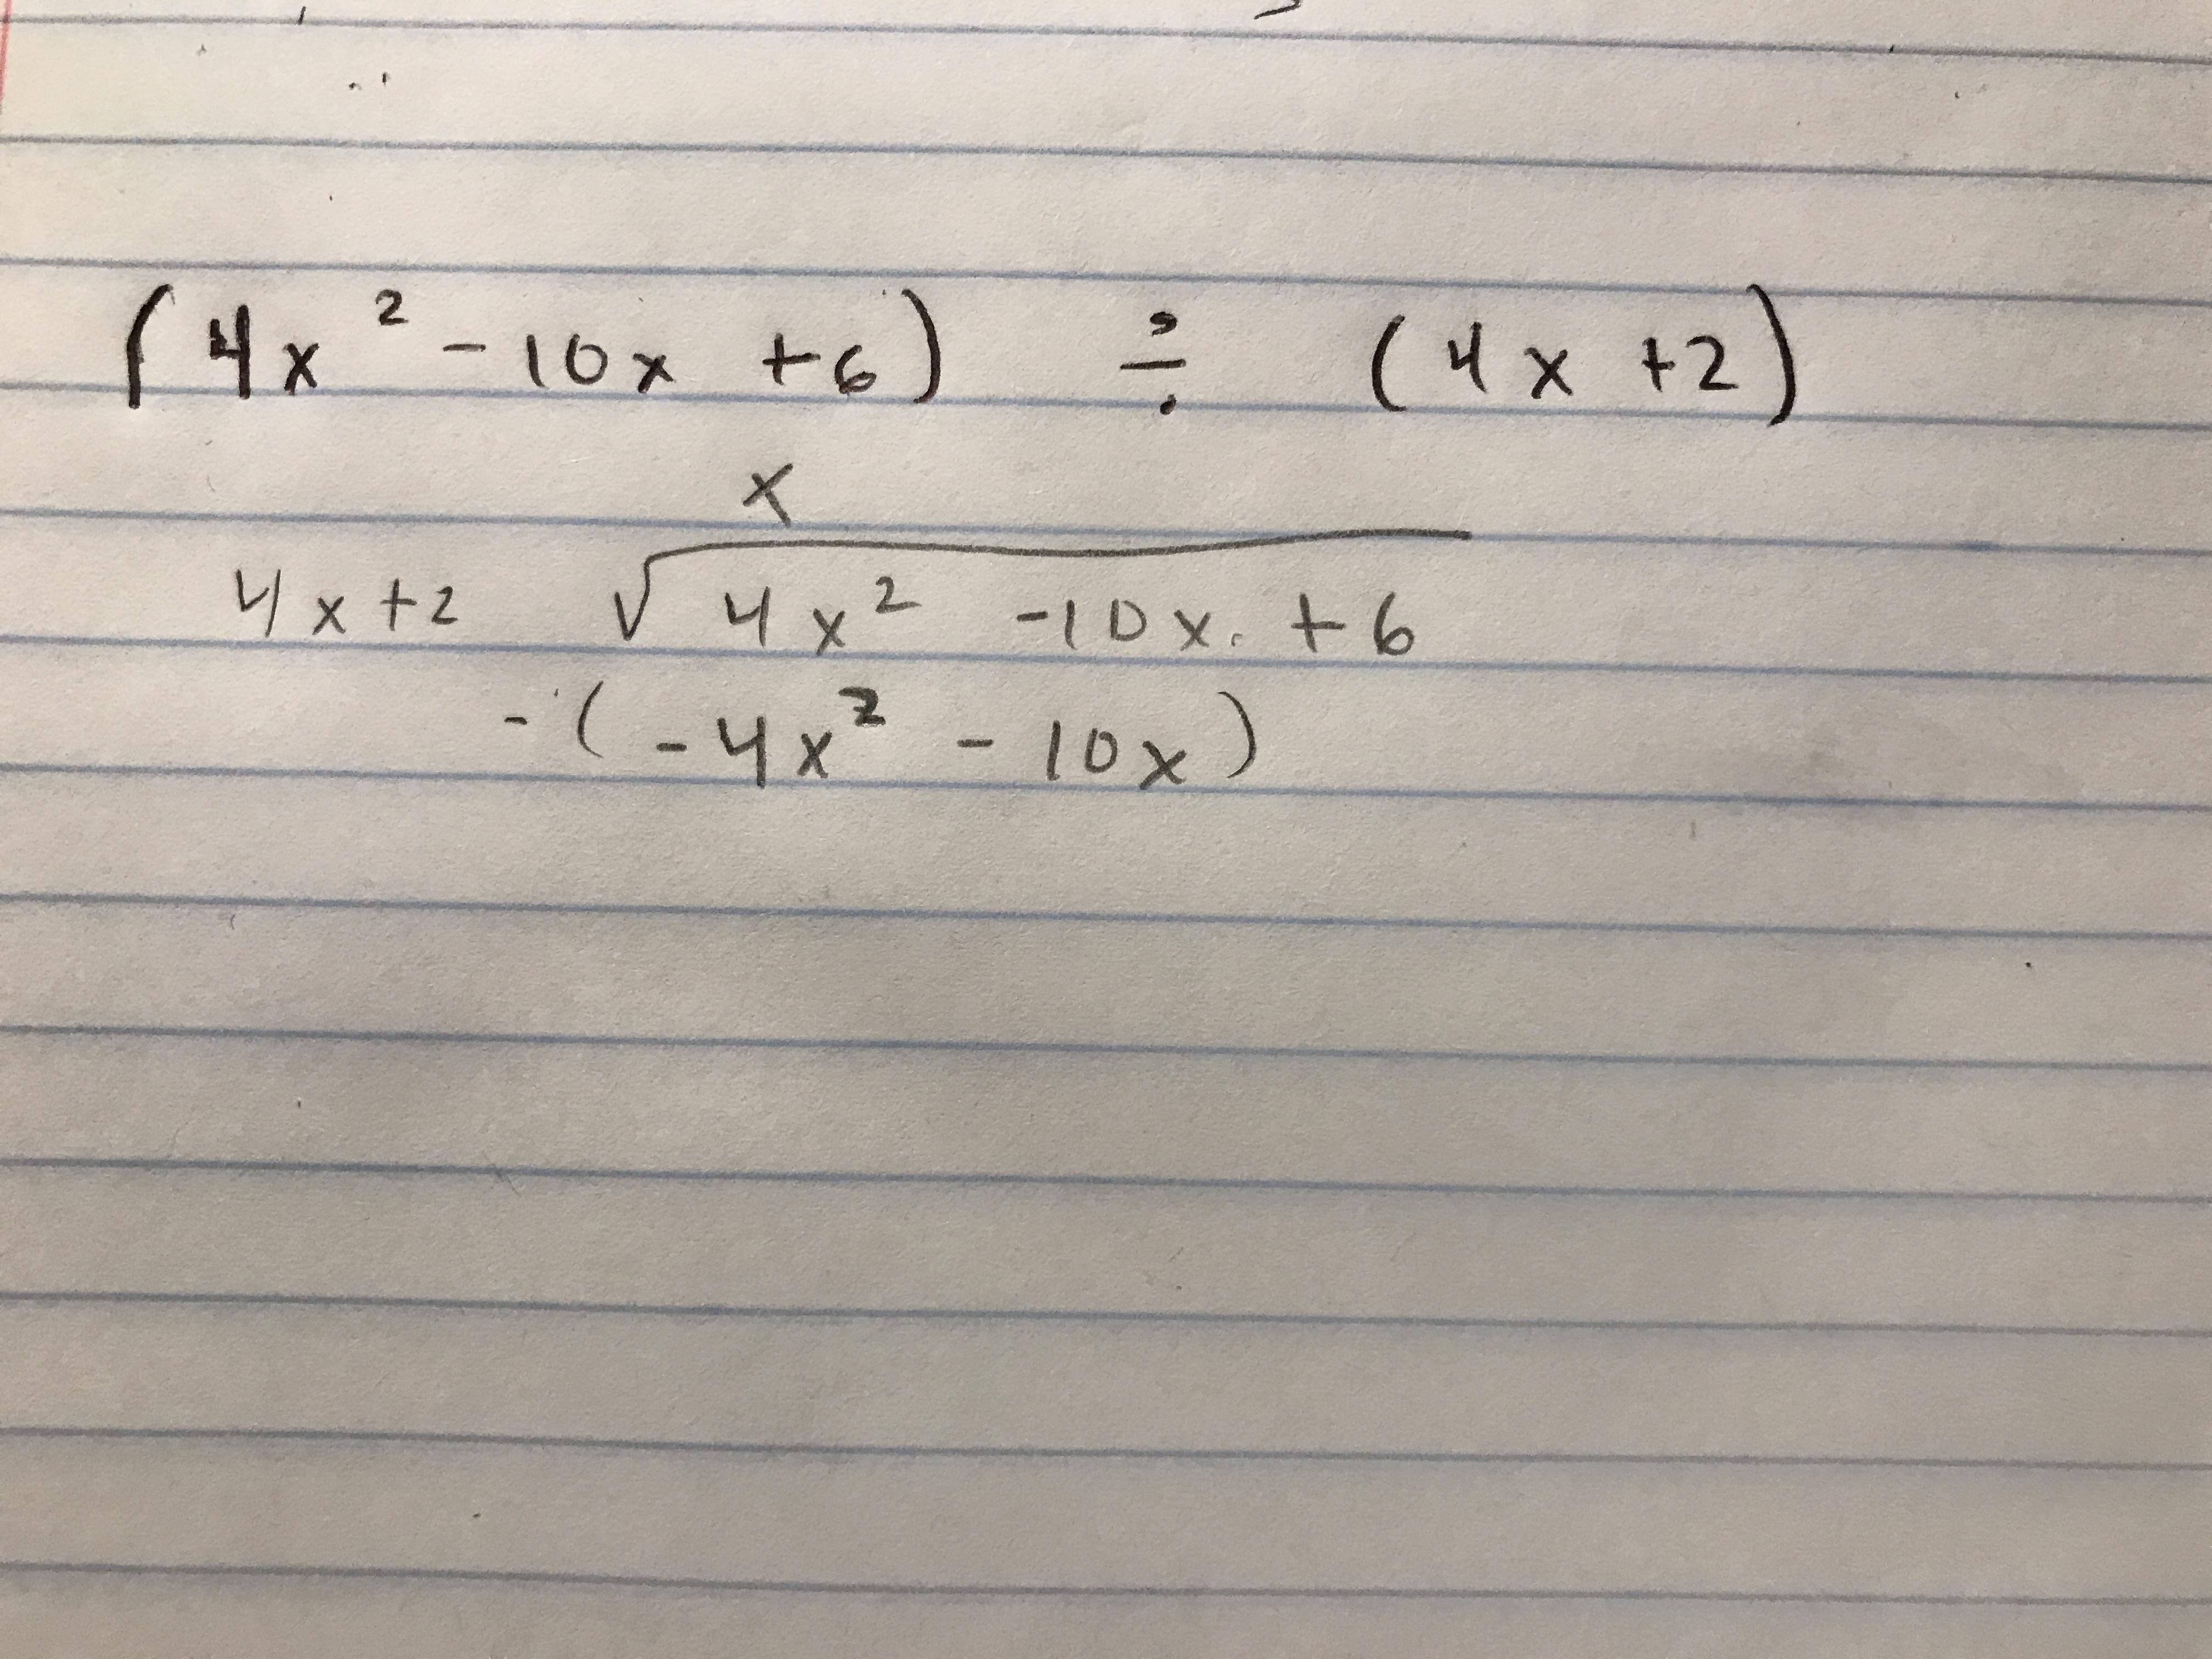 2 (Чx*- 16х +e) (x +2 X Уxt2 VЧуz -1DY. to 2 -(-ух3 - 10х) IDX